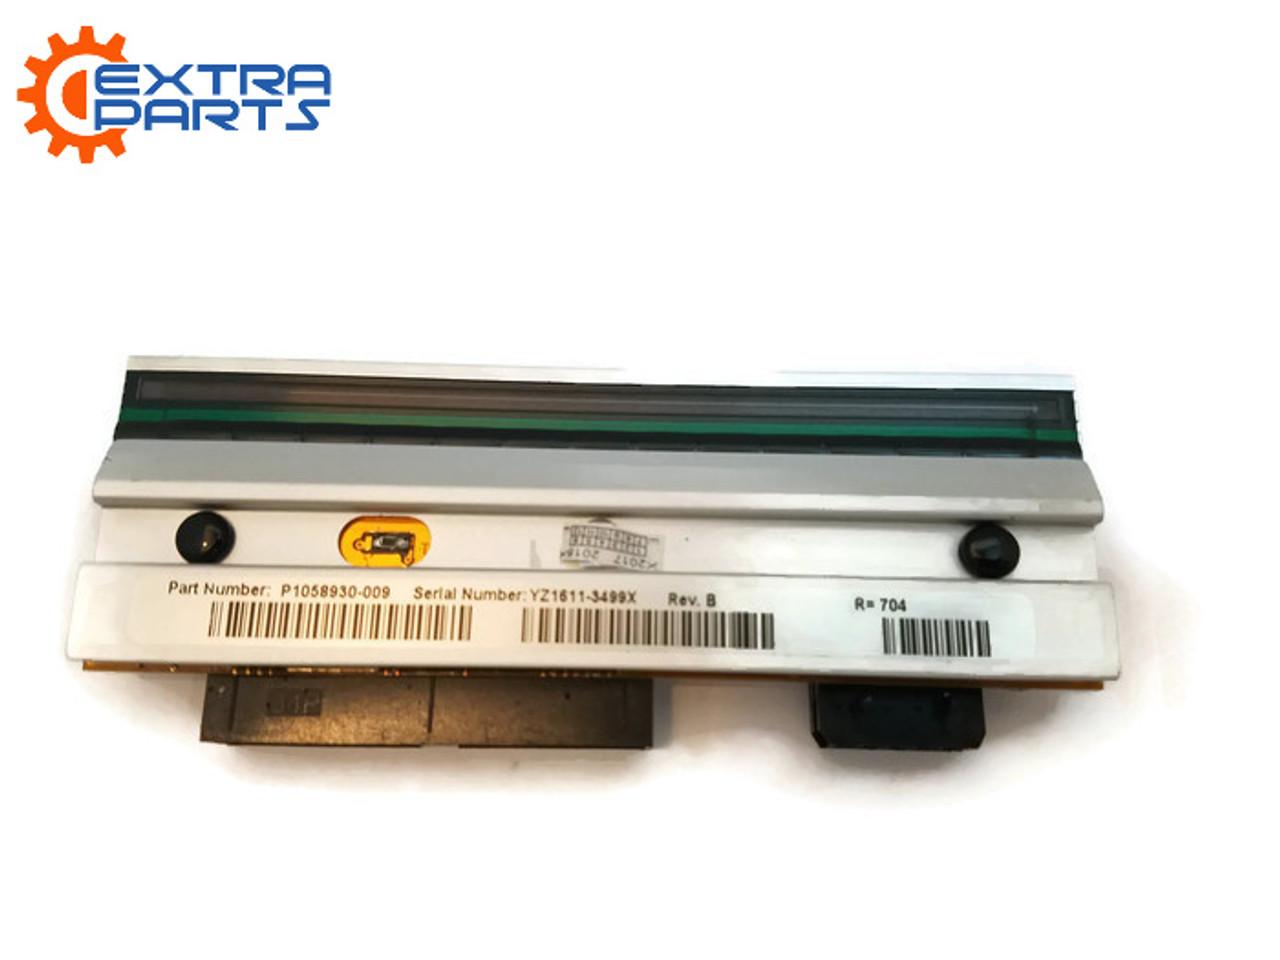 P1058930-009 Printhead for Zebra ZT410 Thermal Label Printer 203DPI